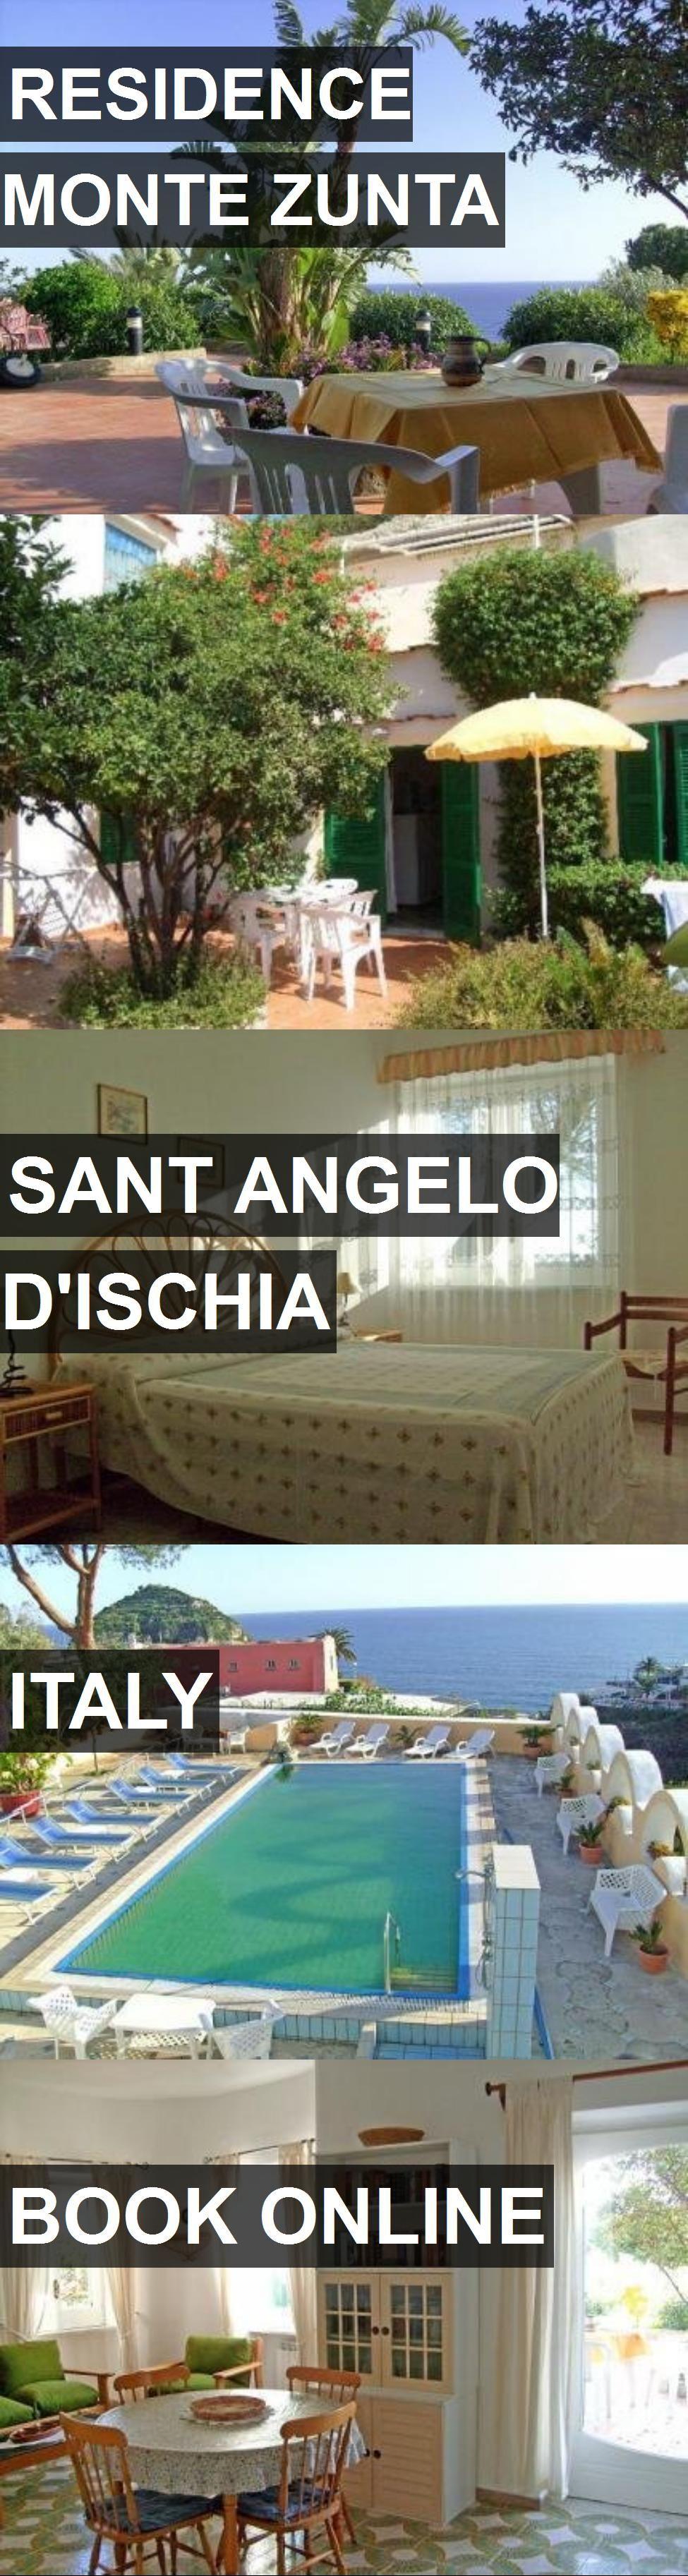 Hotel RESIDENCE MONTE ZUNTA in Sant Angelo D'Ischia, Italy